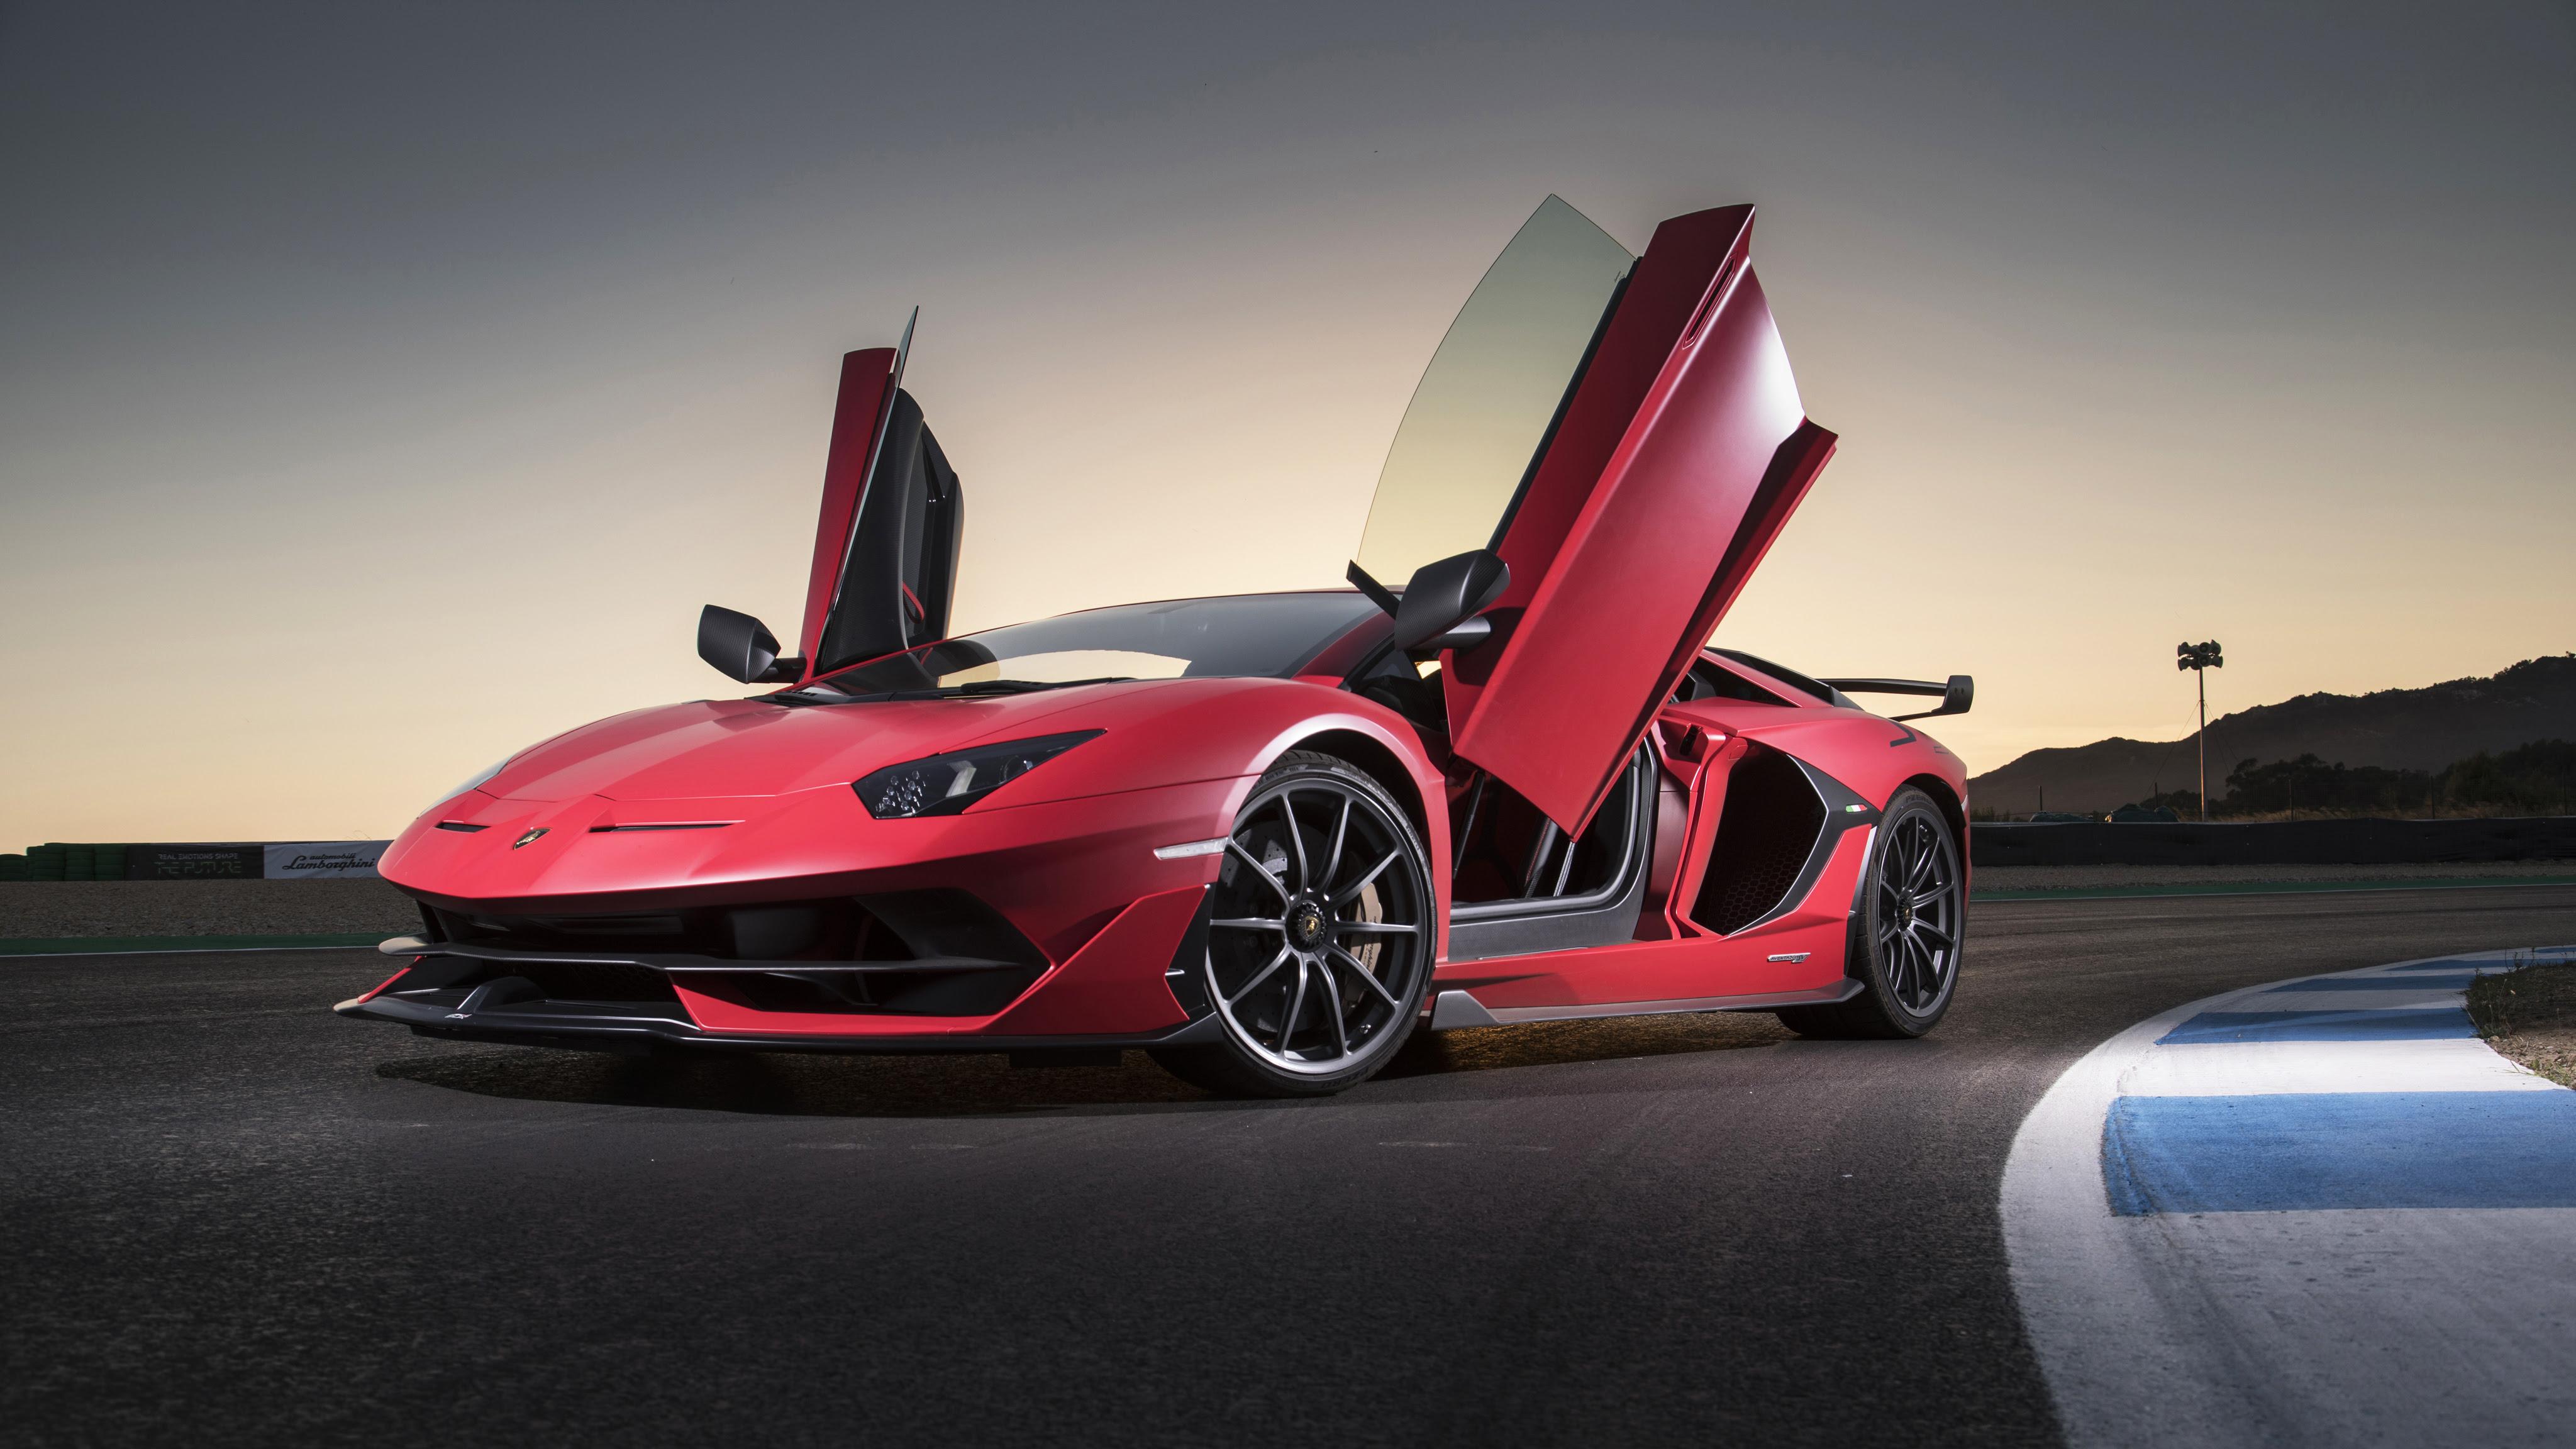 Black Lamborghini Car 4k Wallpaper